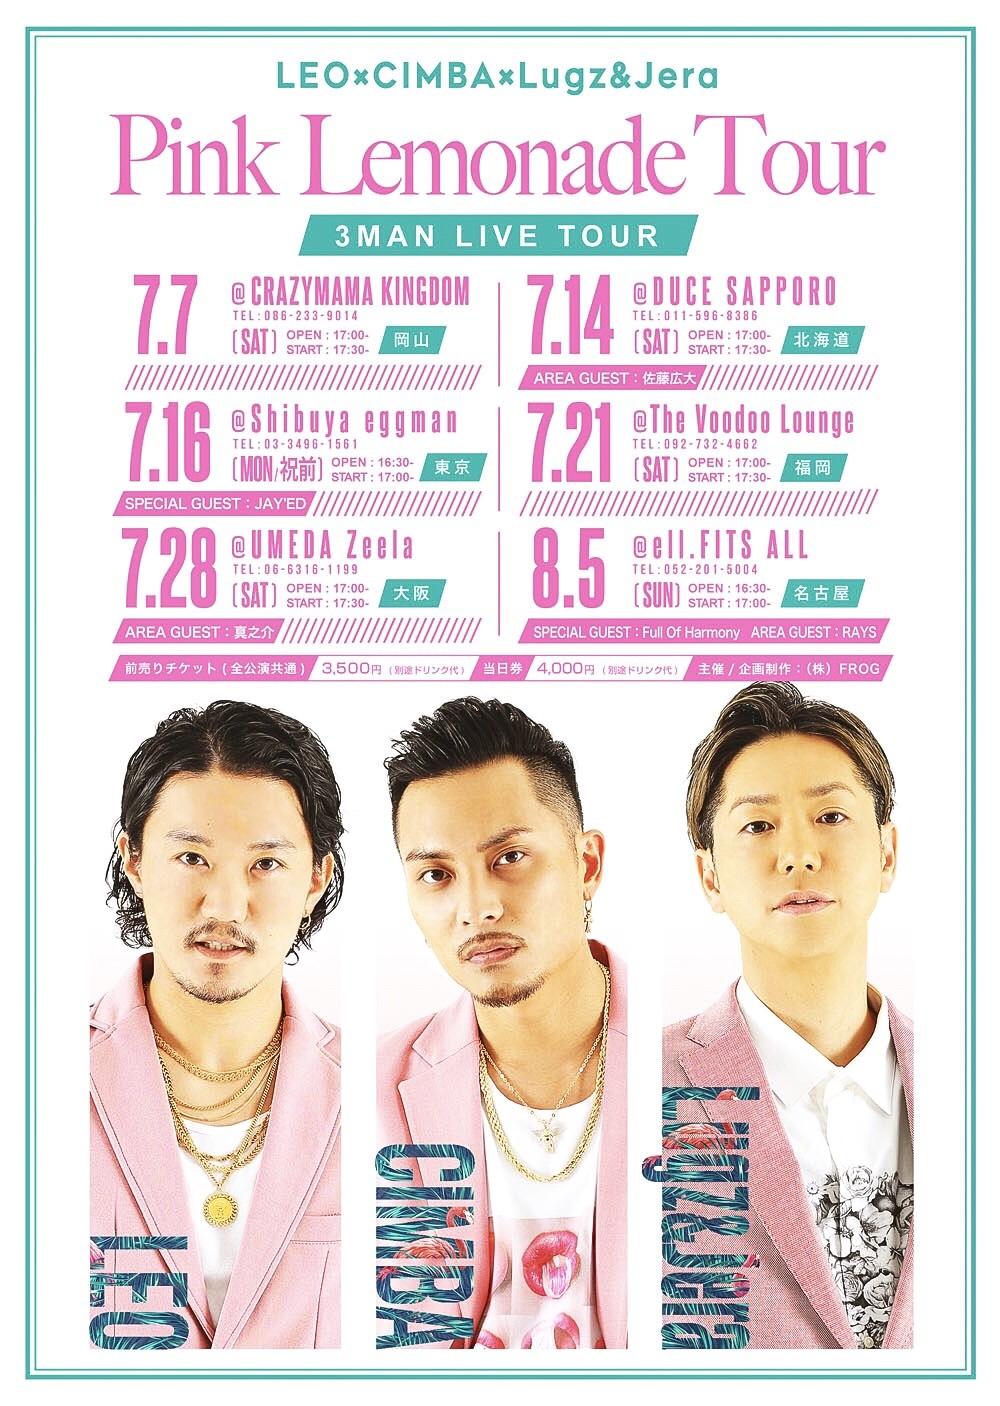 LEO×CIMBA×Lugz&Jera 3MAN LIVE TOUR『Pink Lemonade Tour』